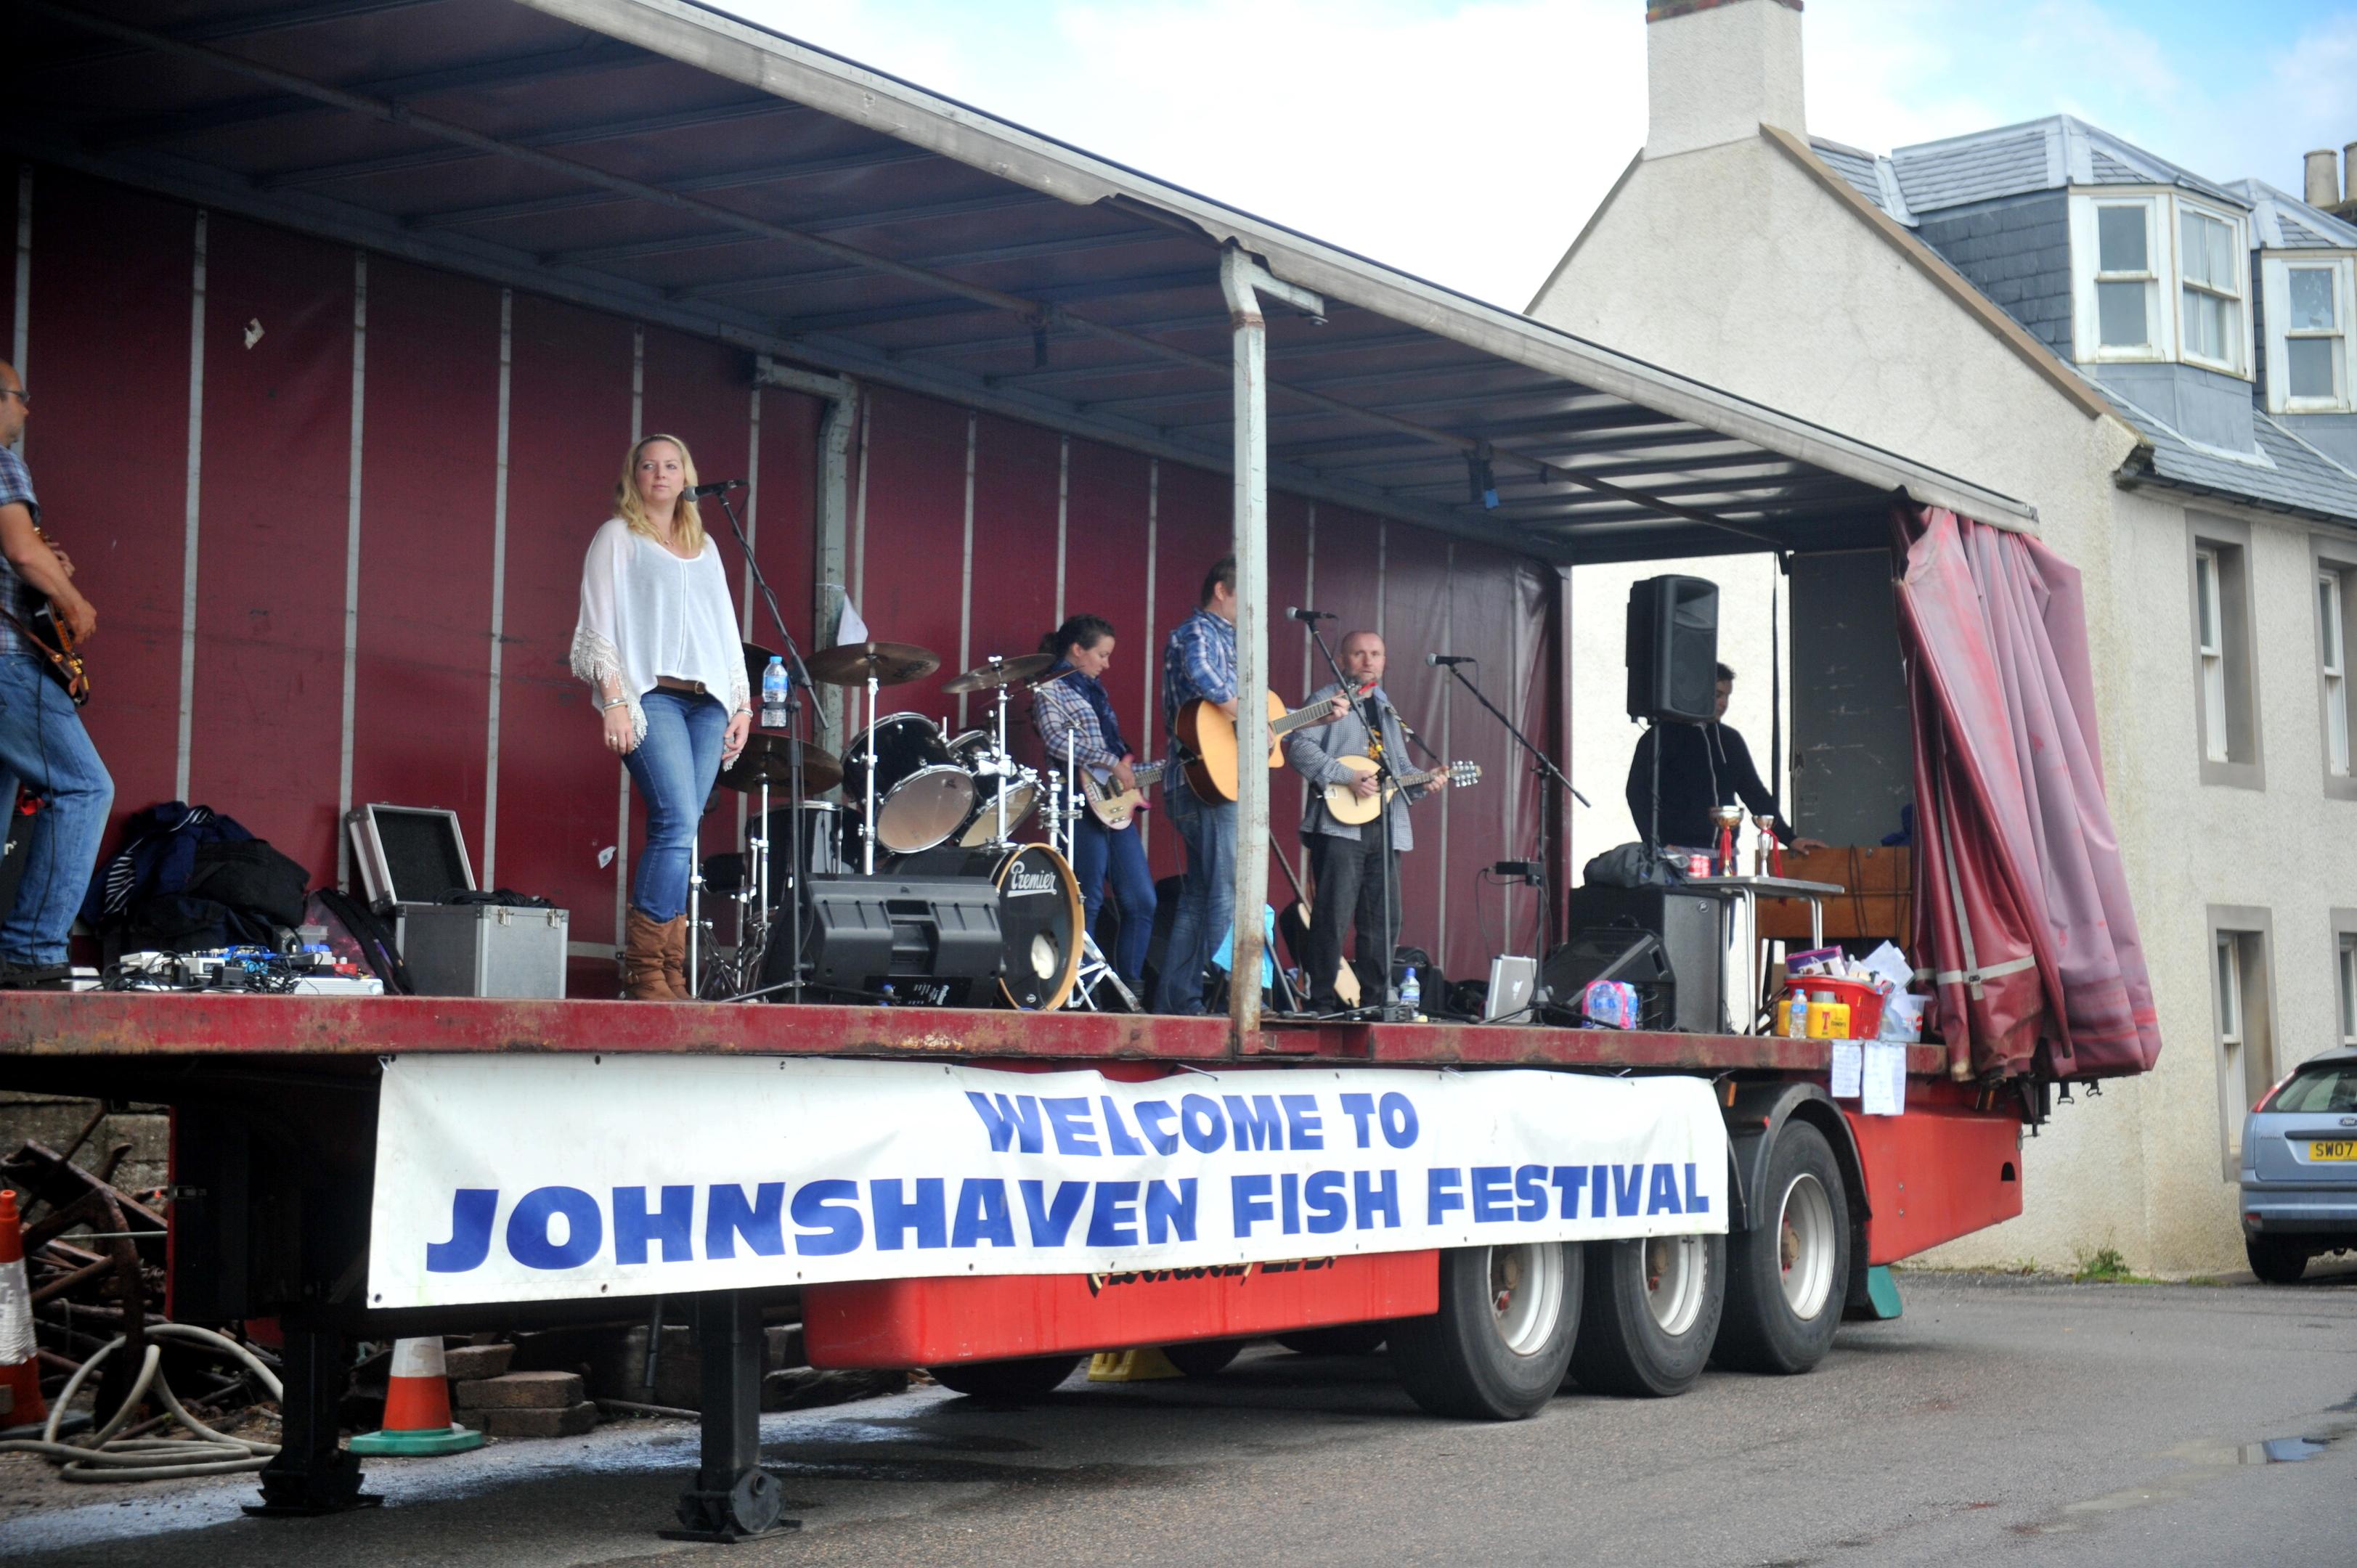 Event:  The Johnshaven Fish Festival last year.